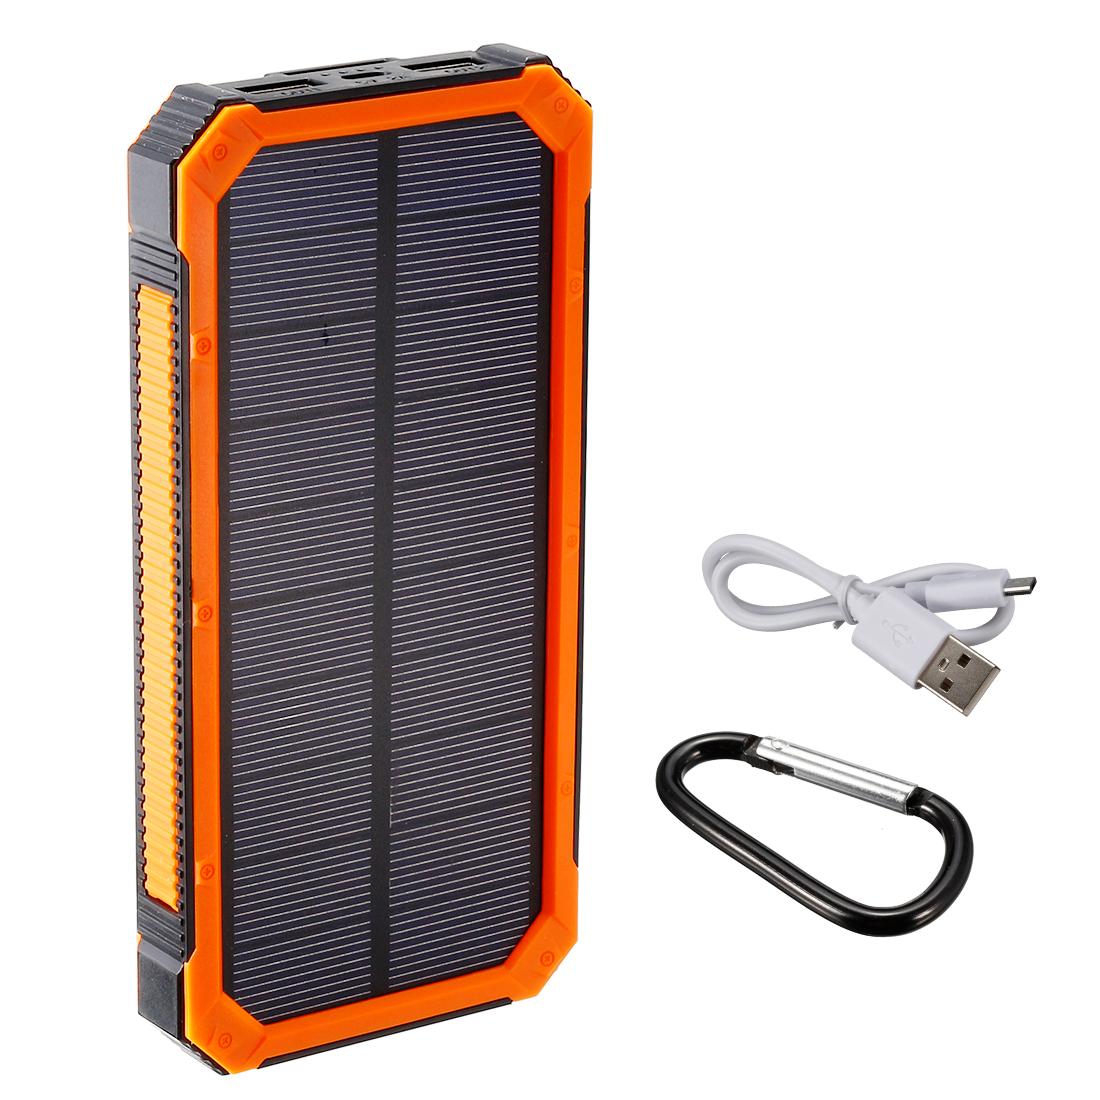 1.5W 10000mAh Solar Charger Dual USB Power Bank Flashlight Orange